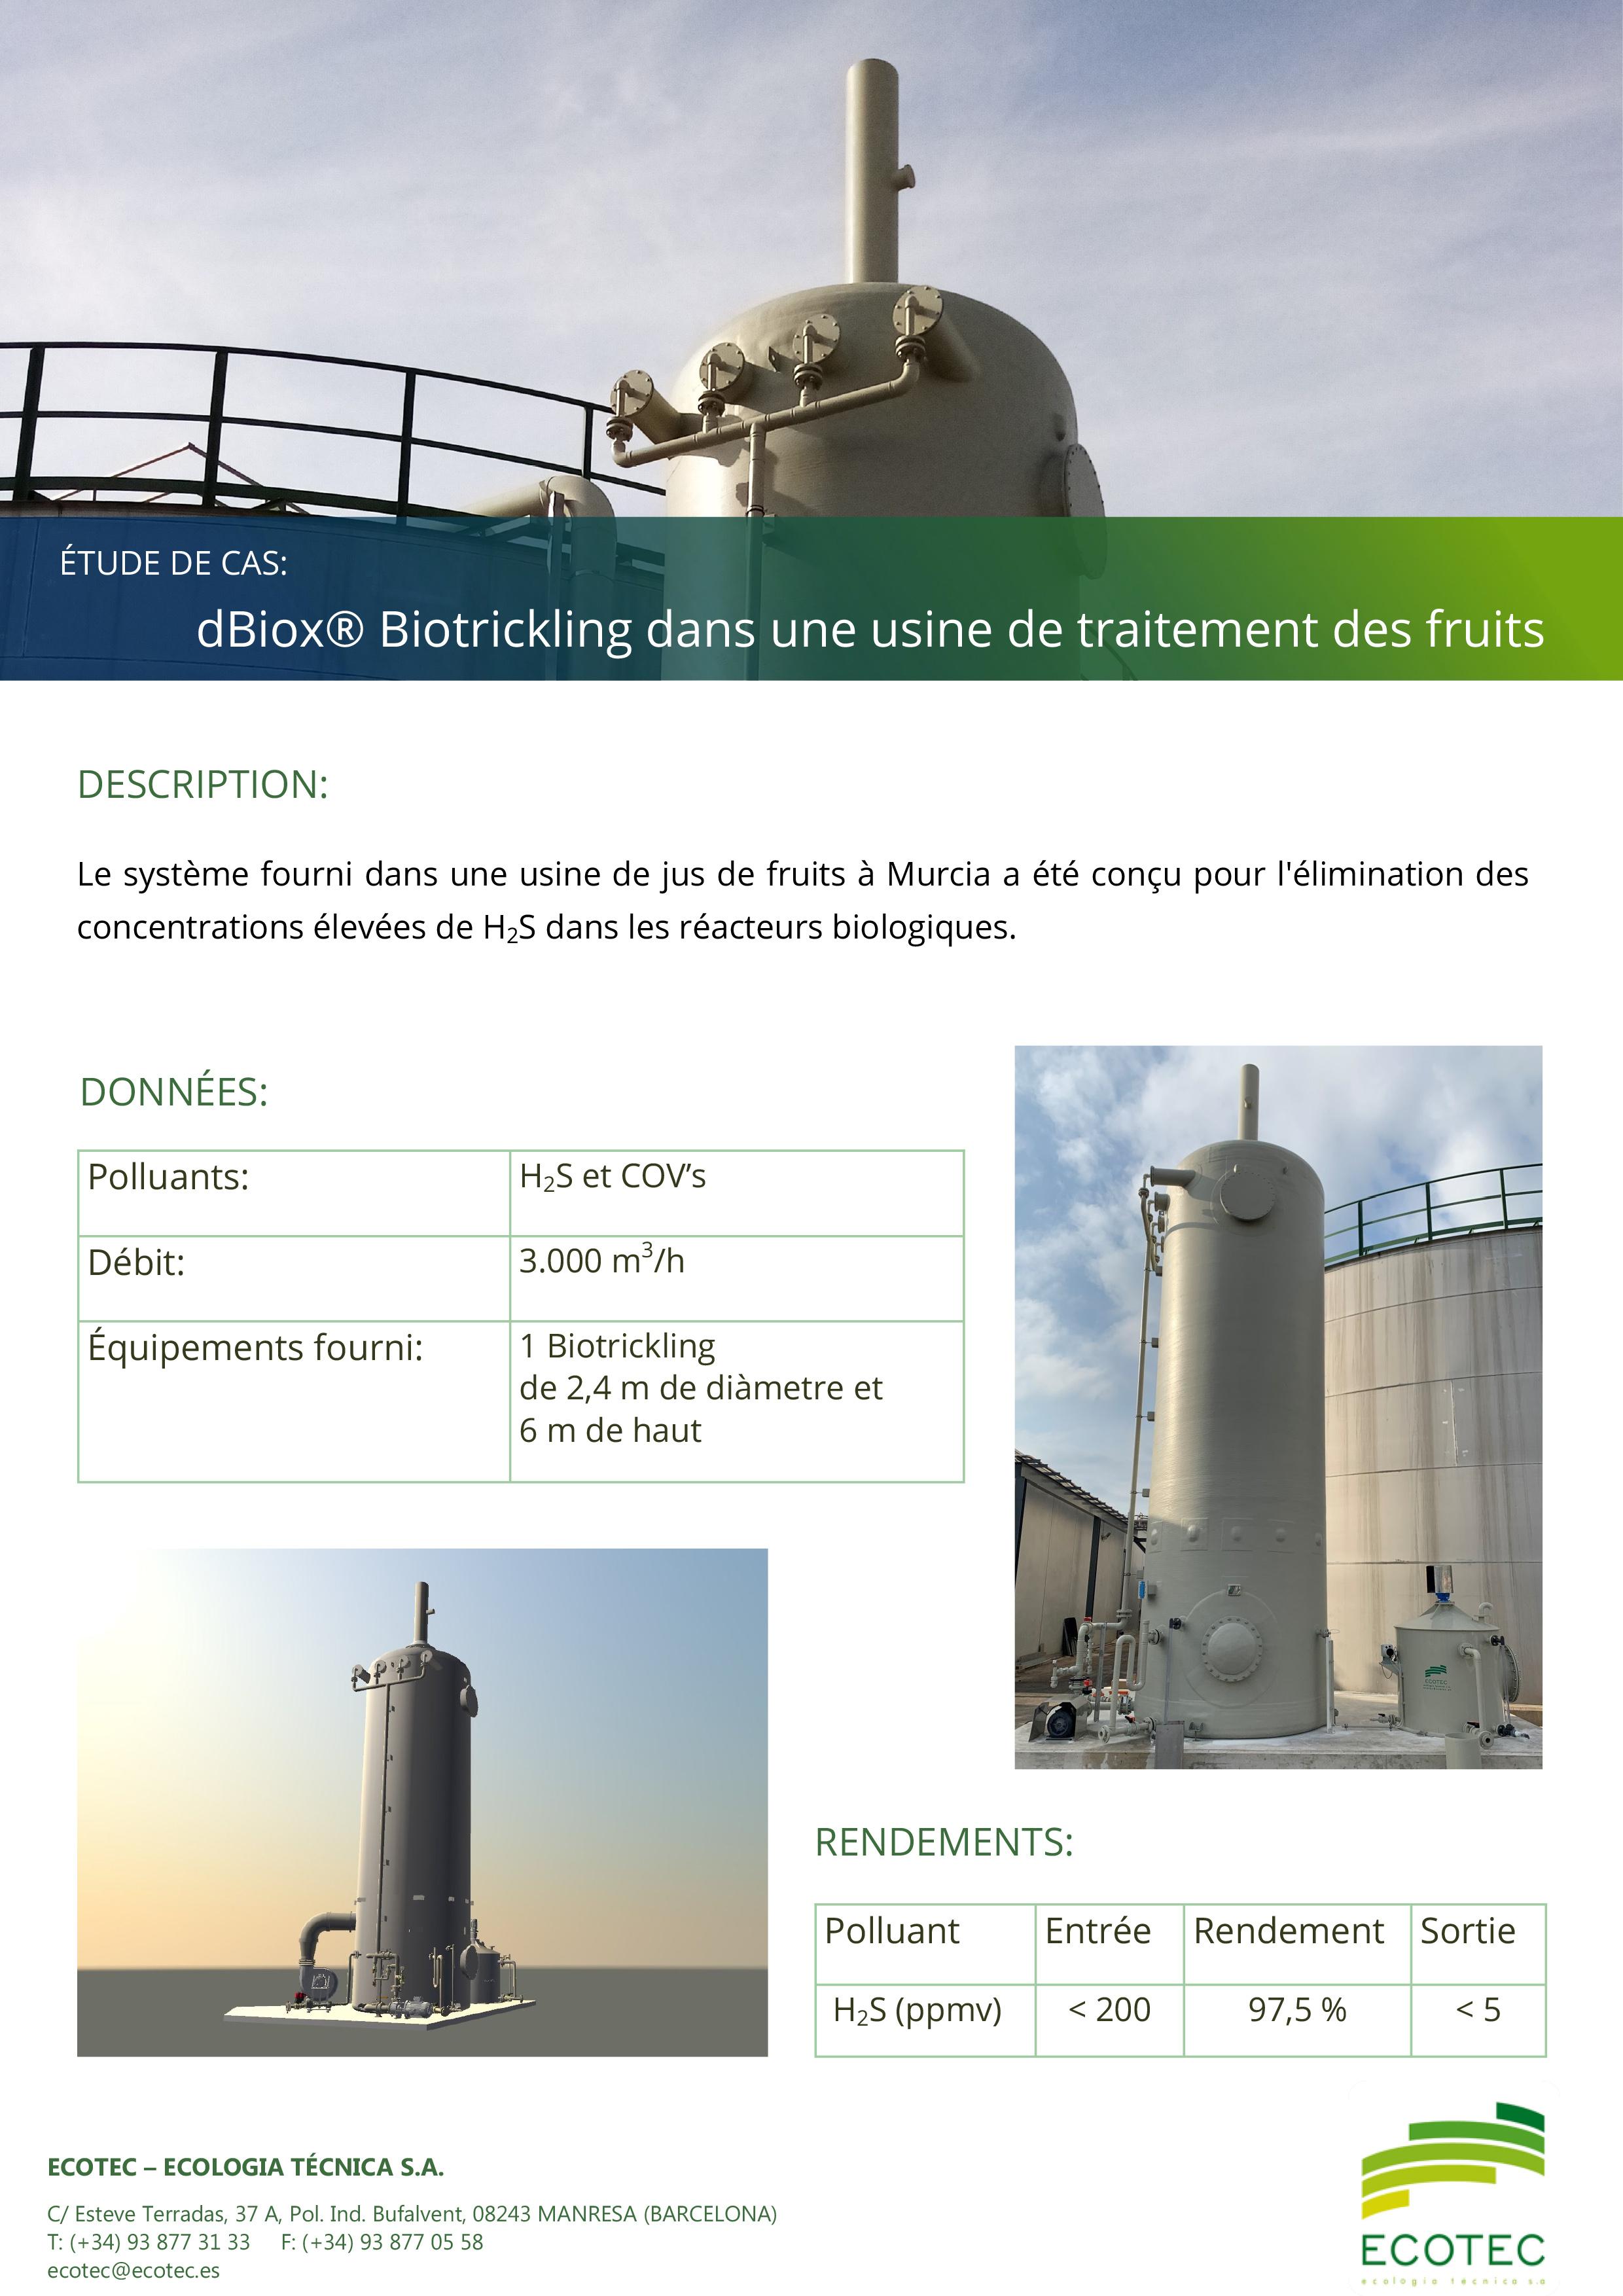 Biotrickling dBiox traitement fruits Murcia